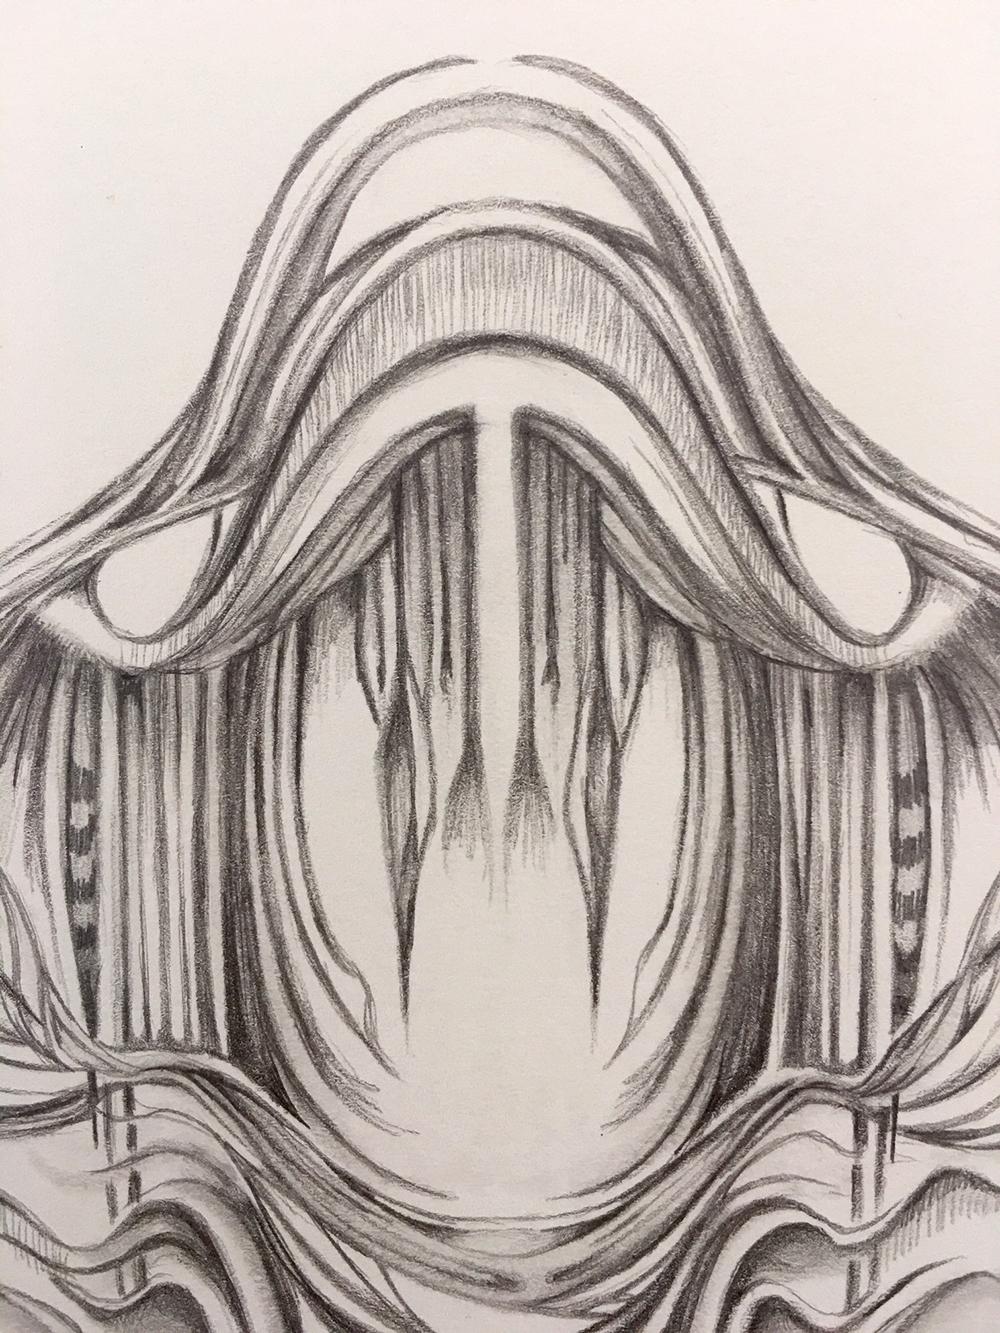 Field Sketch 15 - Detail